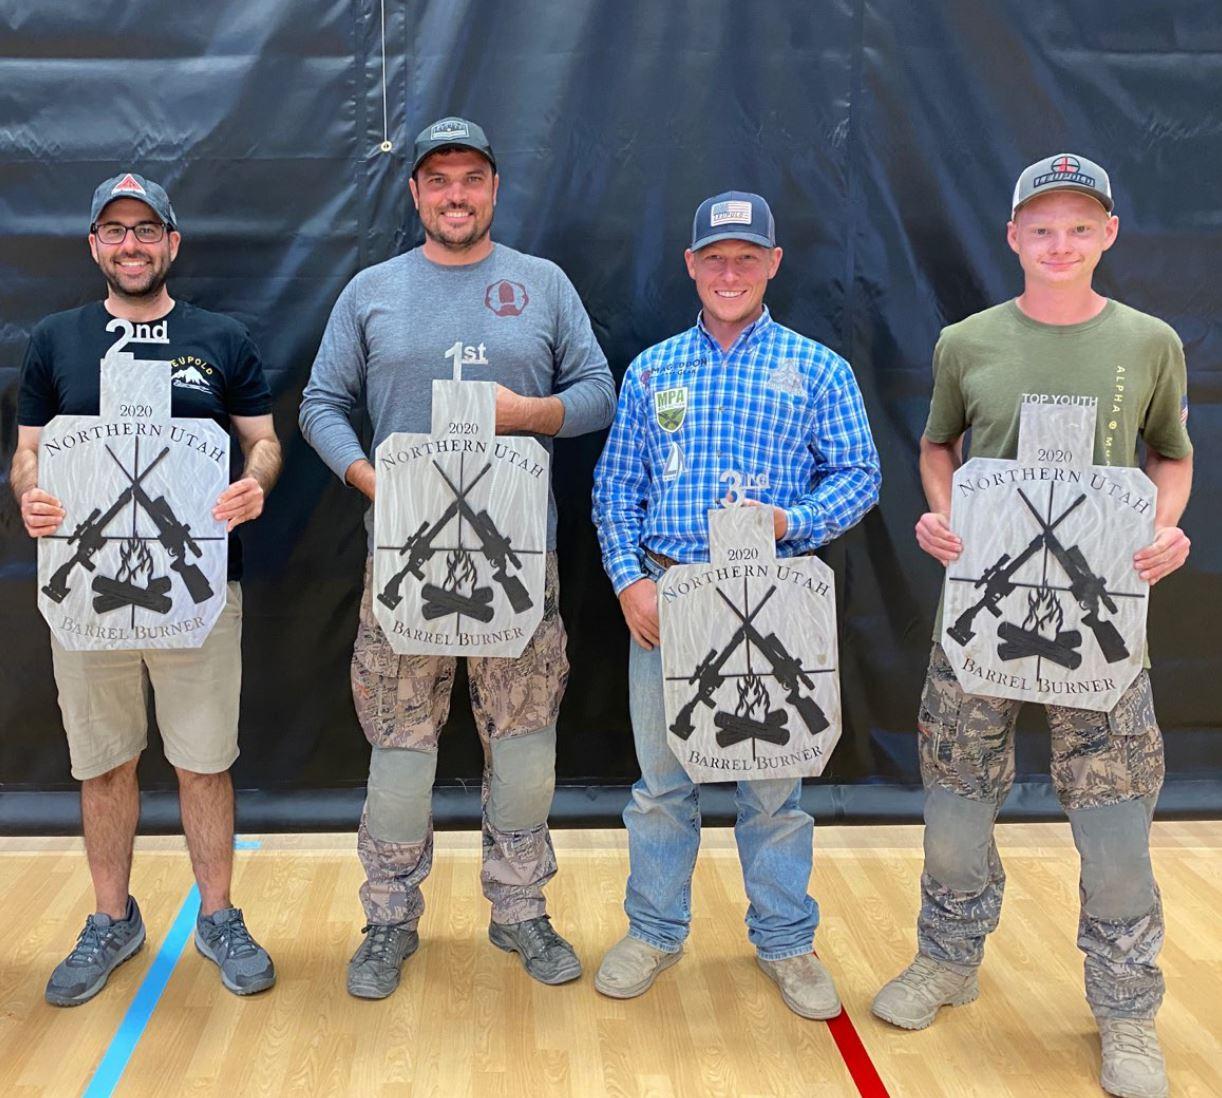 Leupold Core Team Members Dominate National Rifle League's Northern Utah Barrel Burner Match